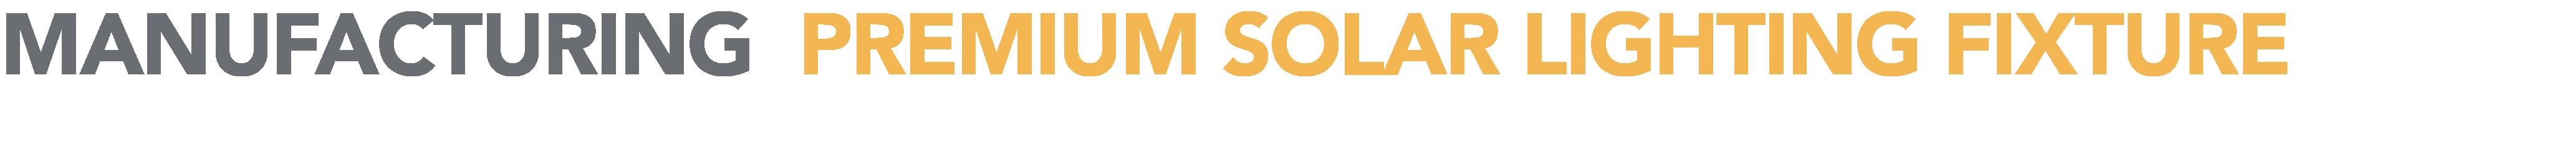 solux_solar_lighting_asset_48.png